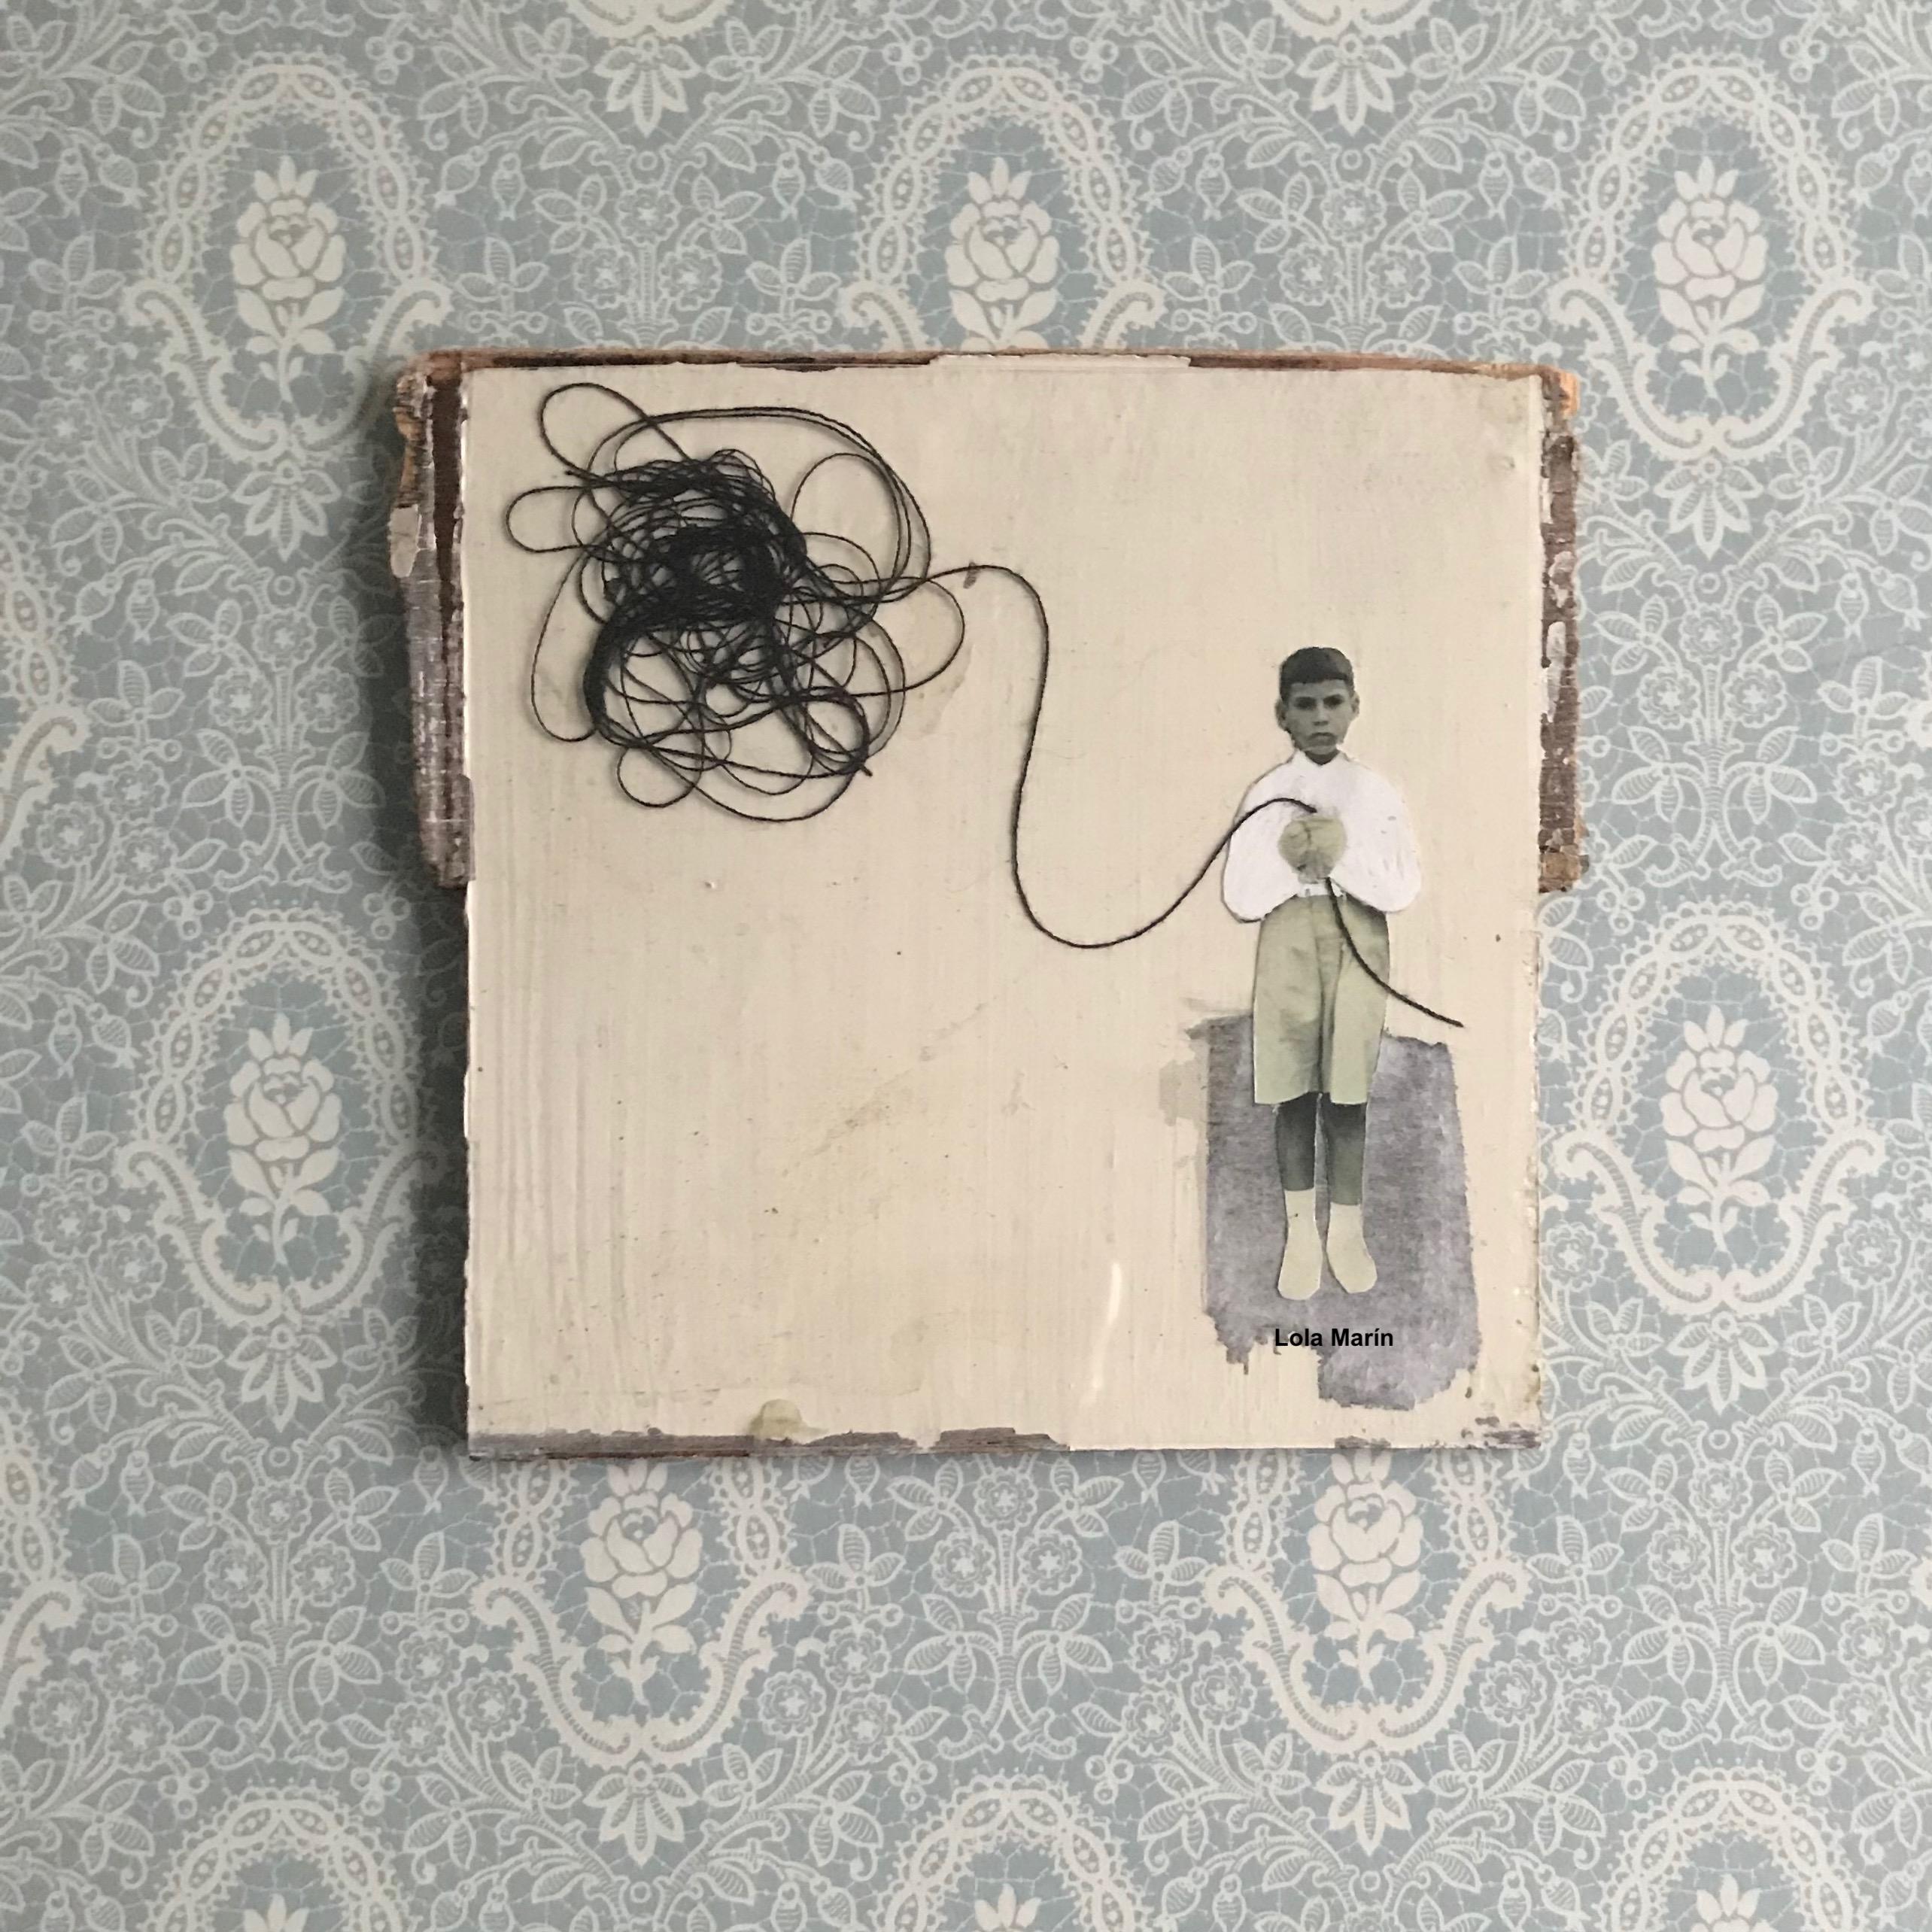 © Lola Marín - La desmemoria